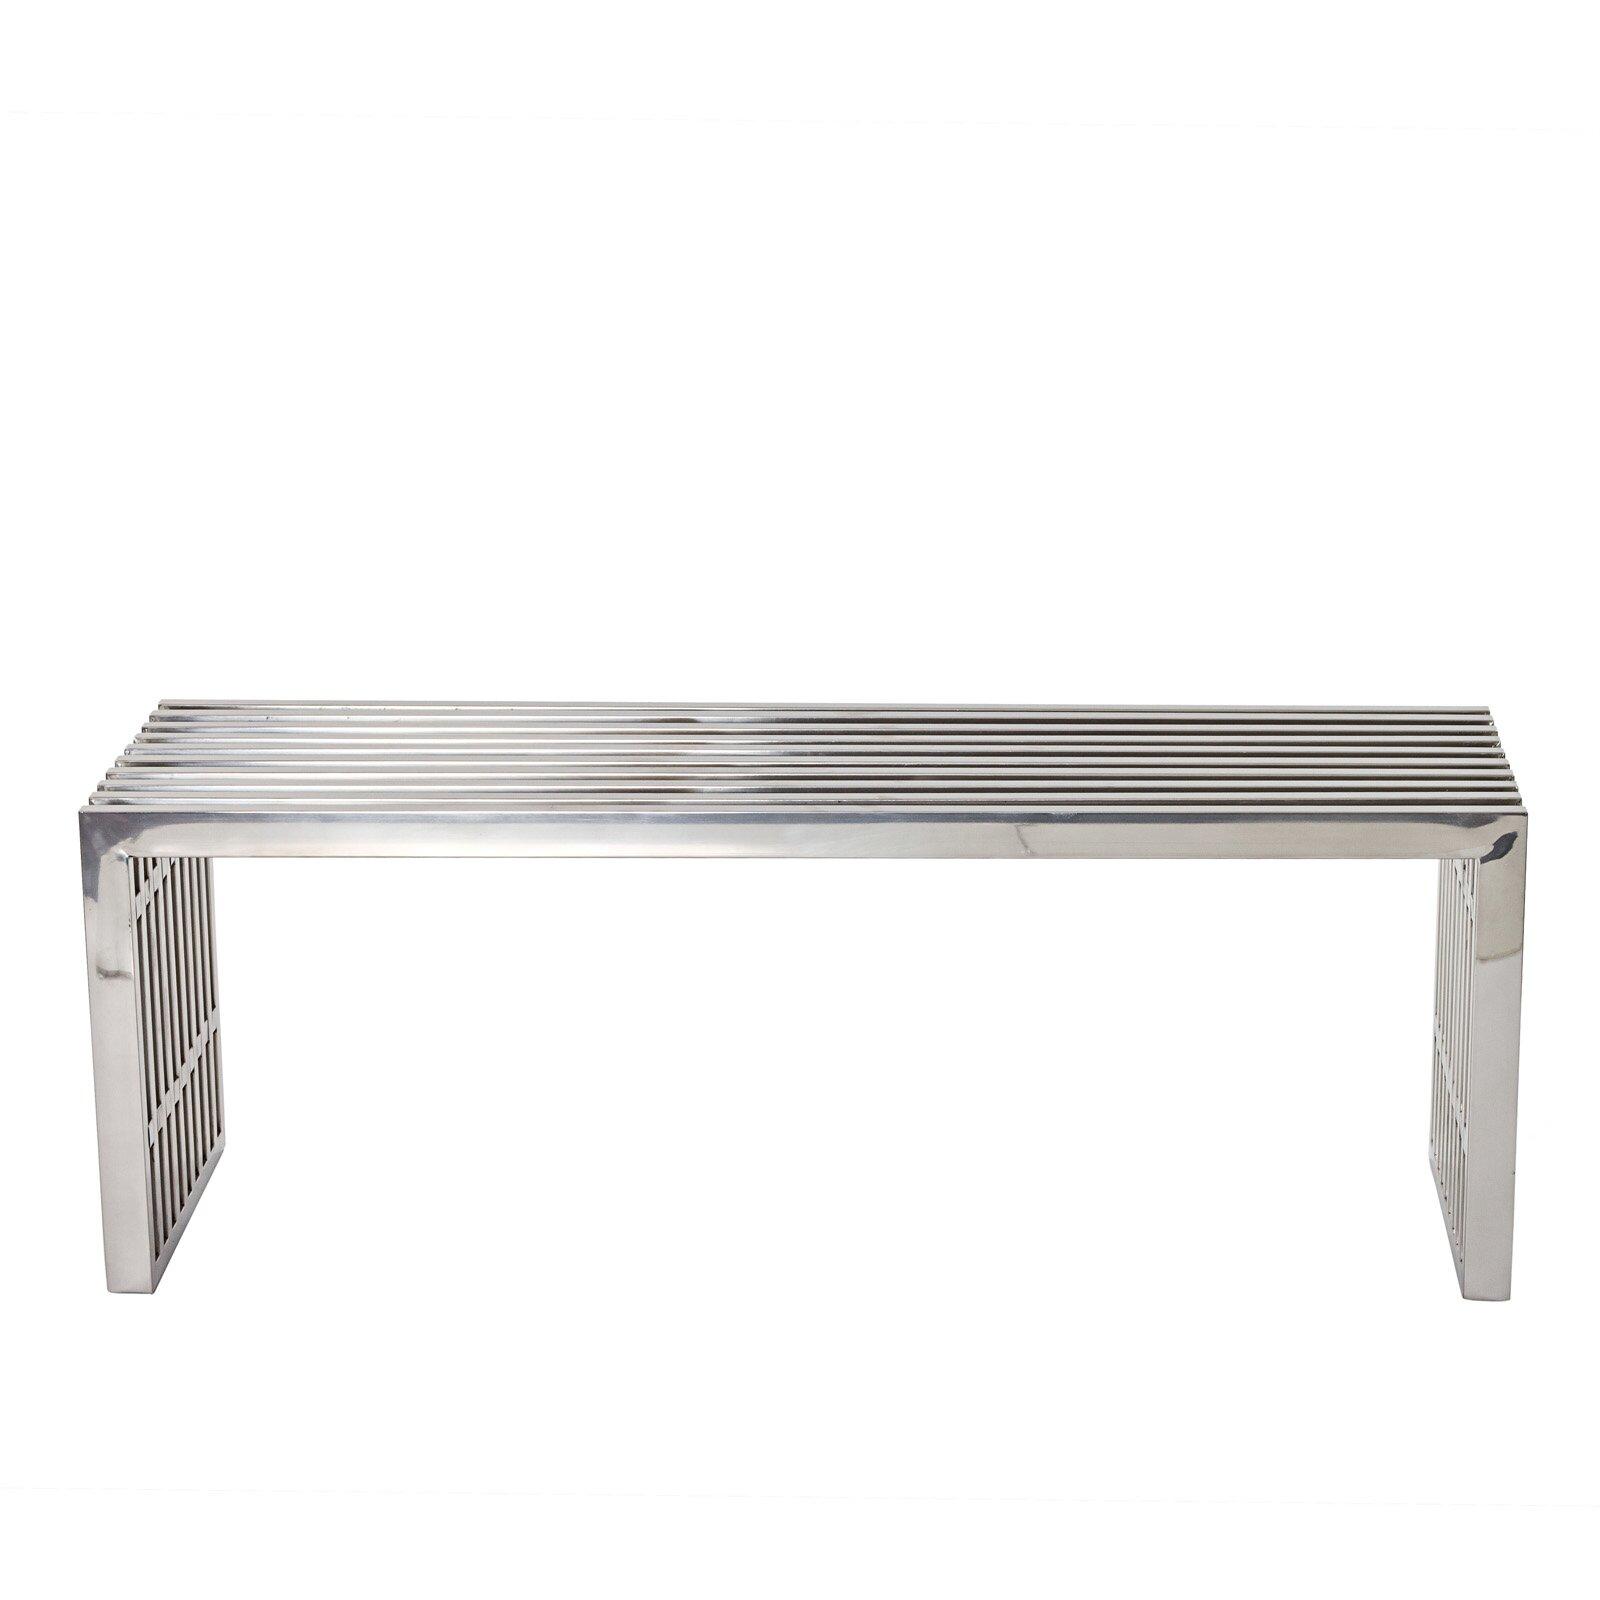 gunnarstainlesssteelbench - wade logan gunnar stainless steel bench reviews wayfair